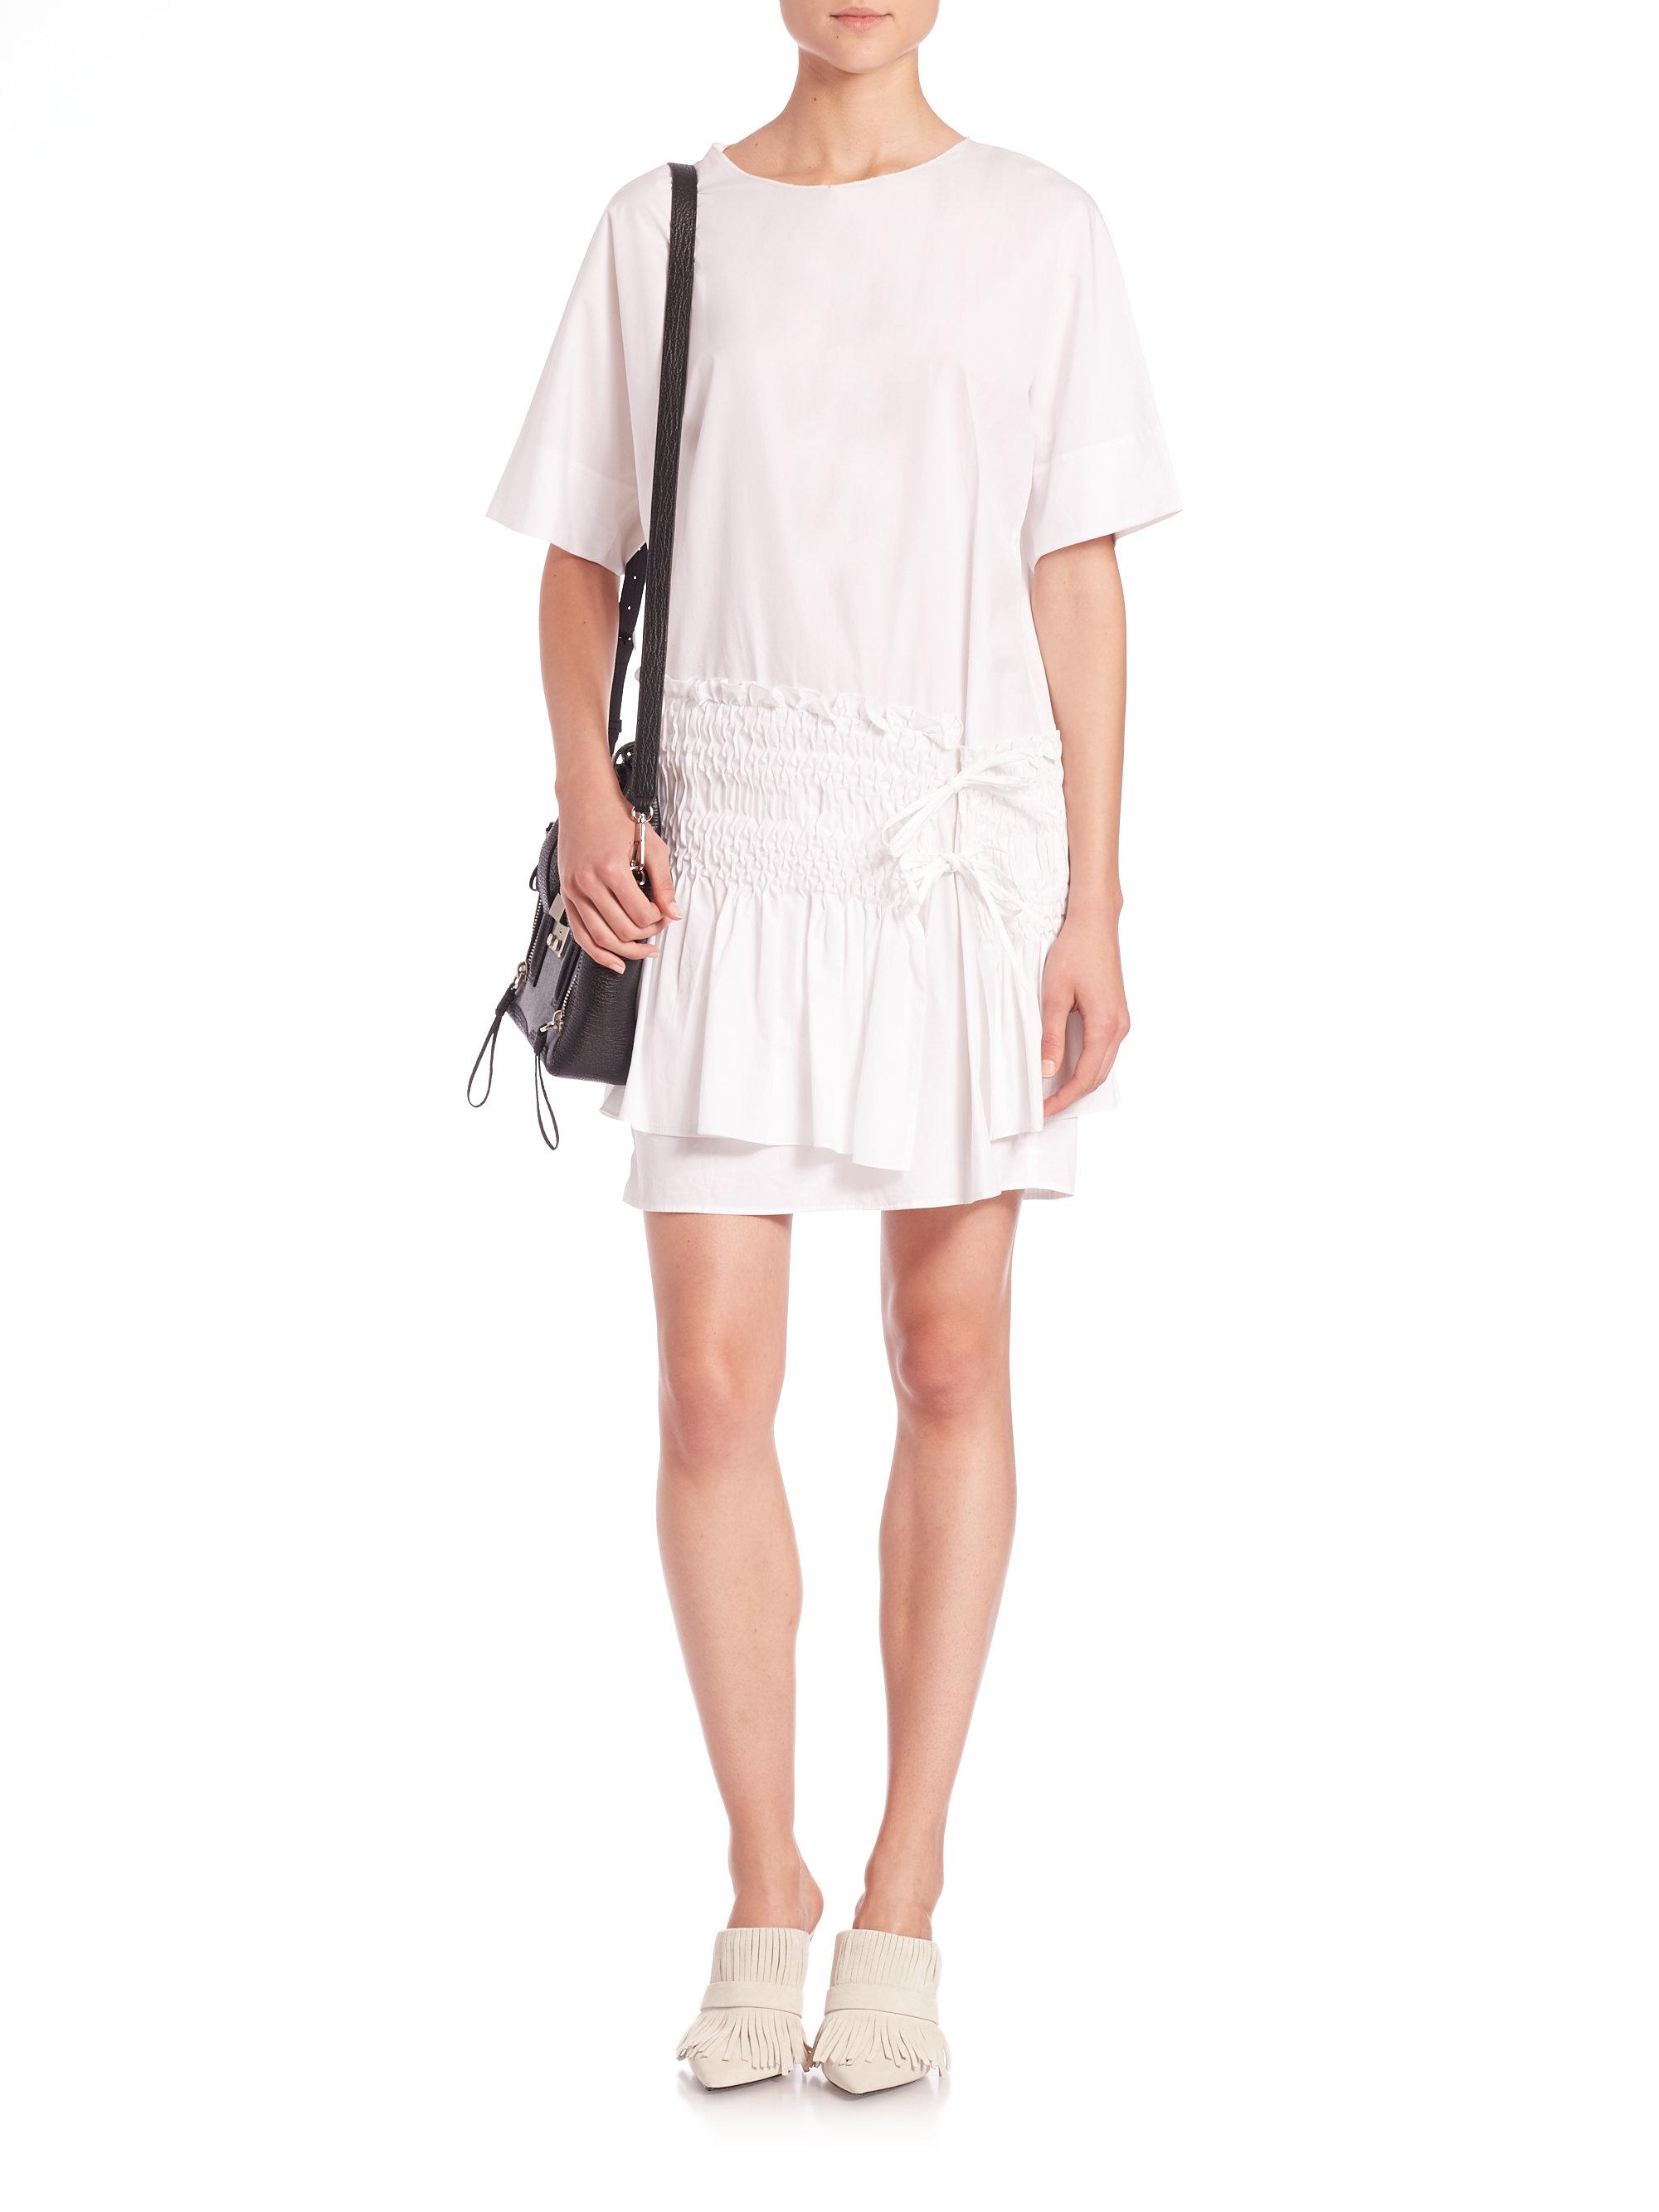 Lyst - 3.1 Phillip Lim Smocked Cotton T-shirt Dress in White